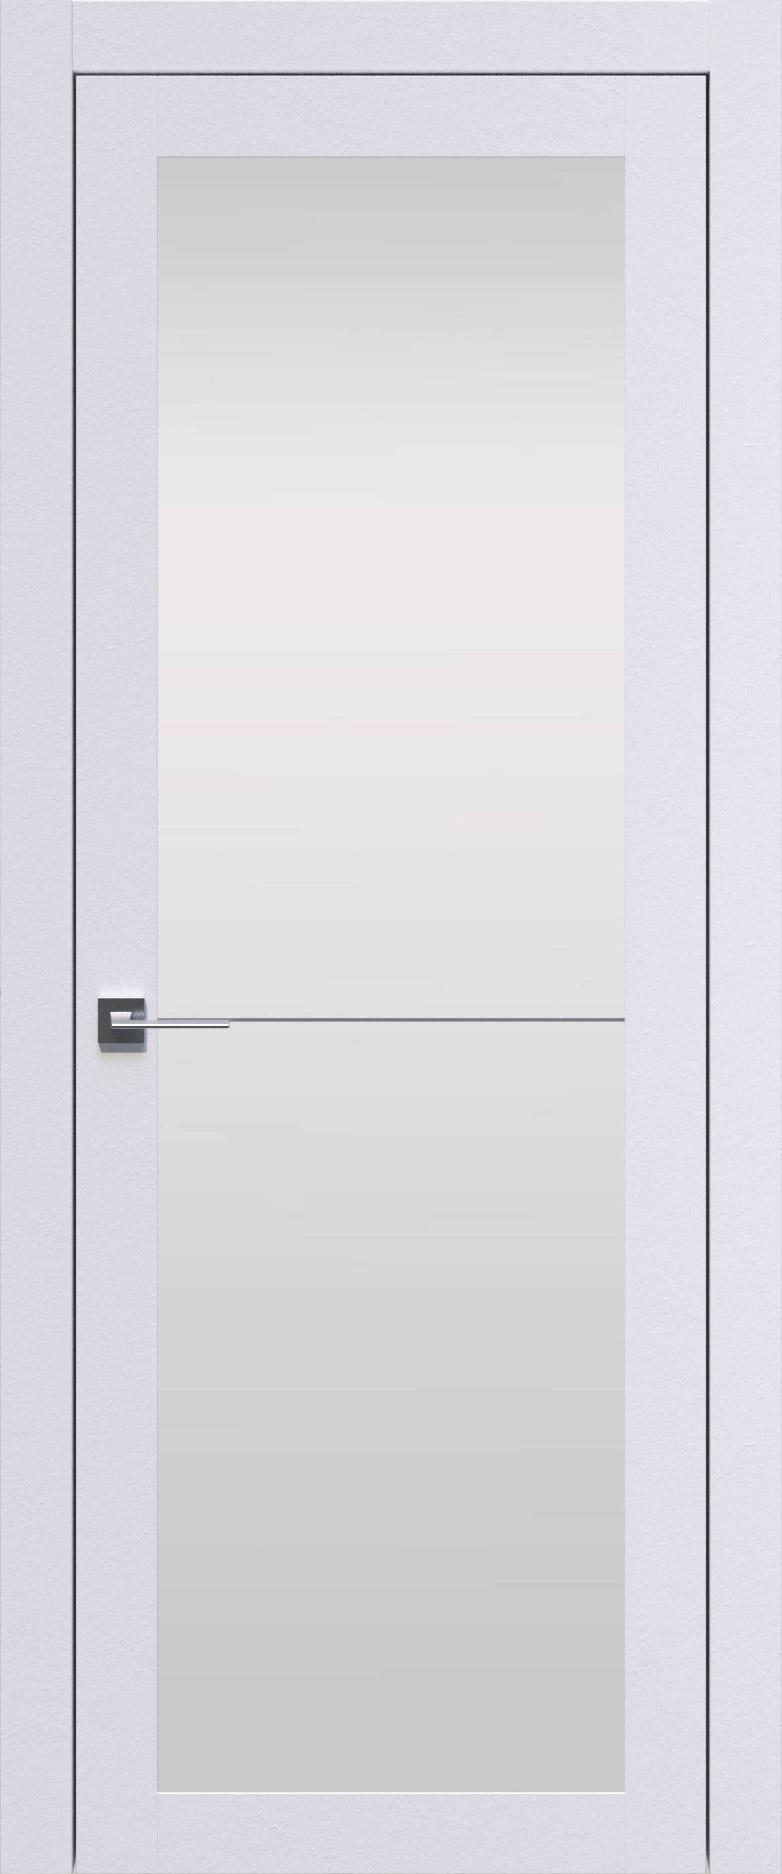 Tivoli З-2 цвет - Арктик белый Со стеклом (ДО)